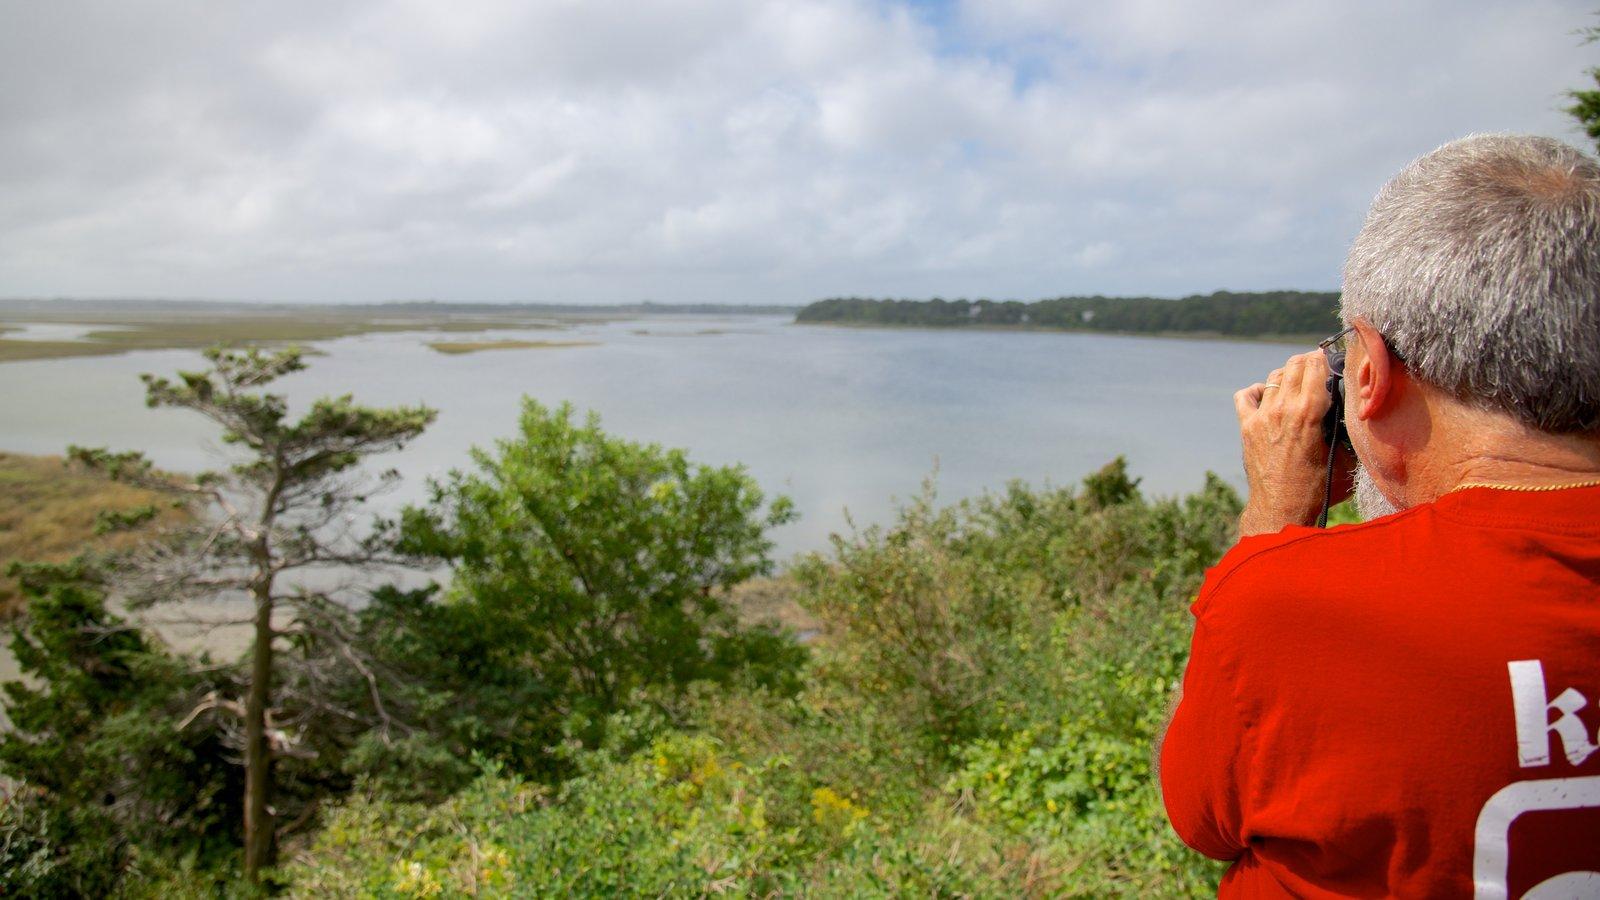 Coast Guard Beach showing general coastal views as well as an individual male